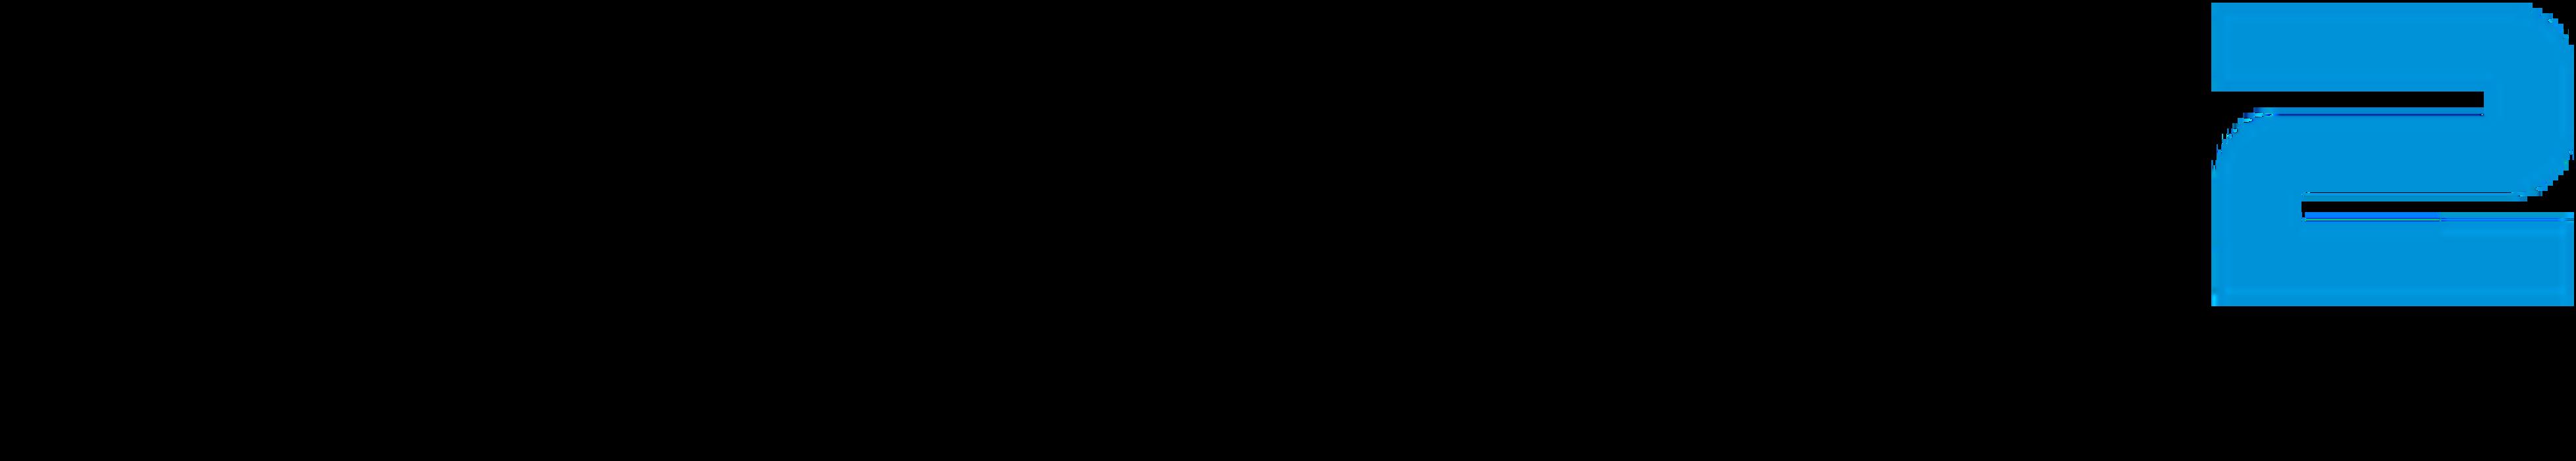 Sim2 logo blanc alt